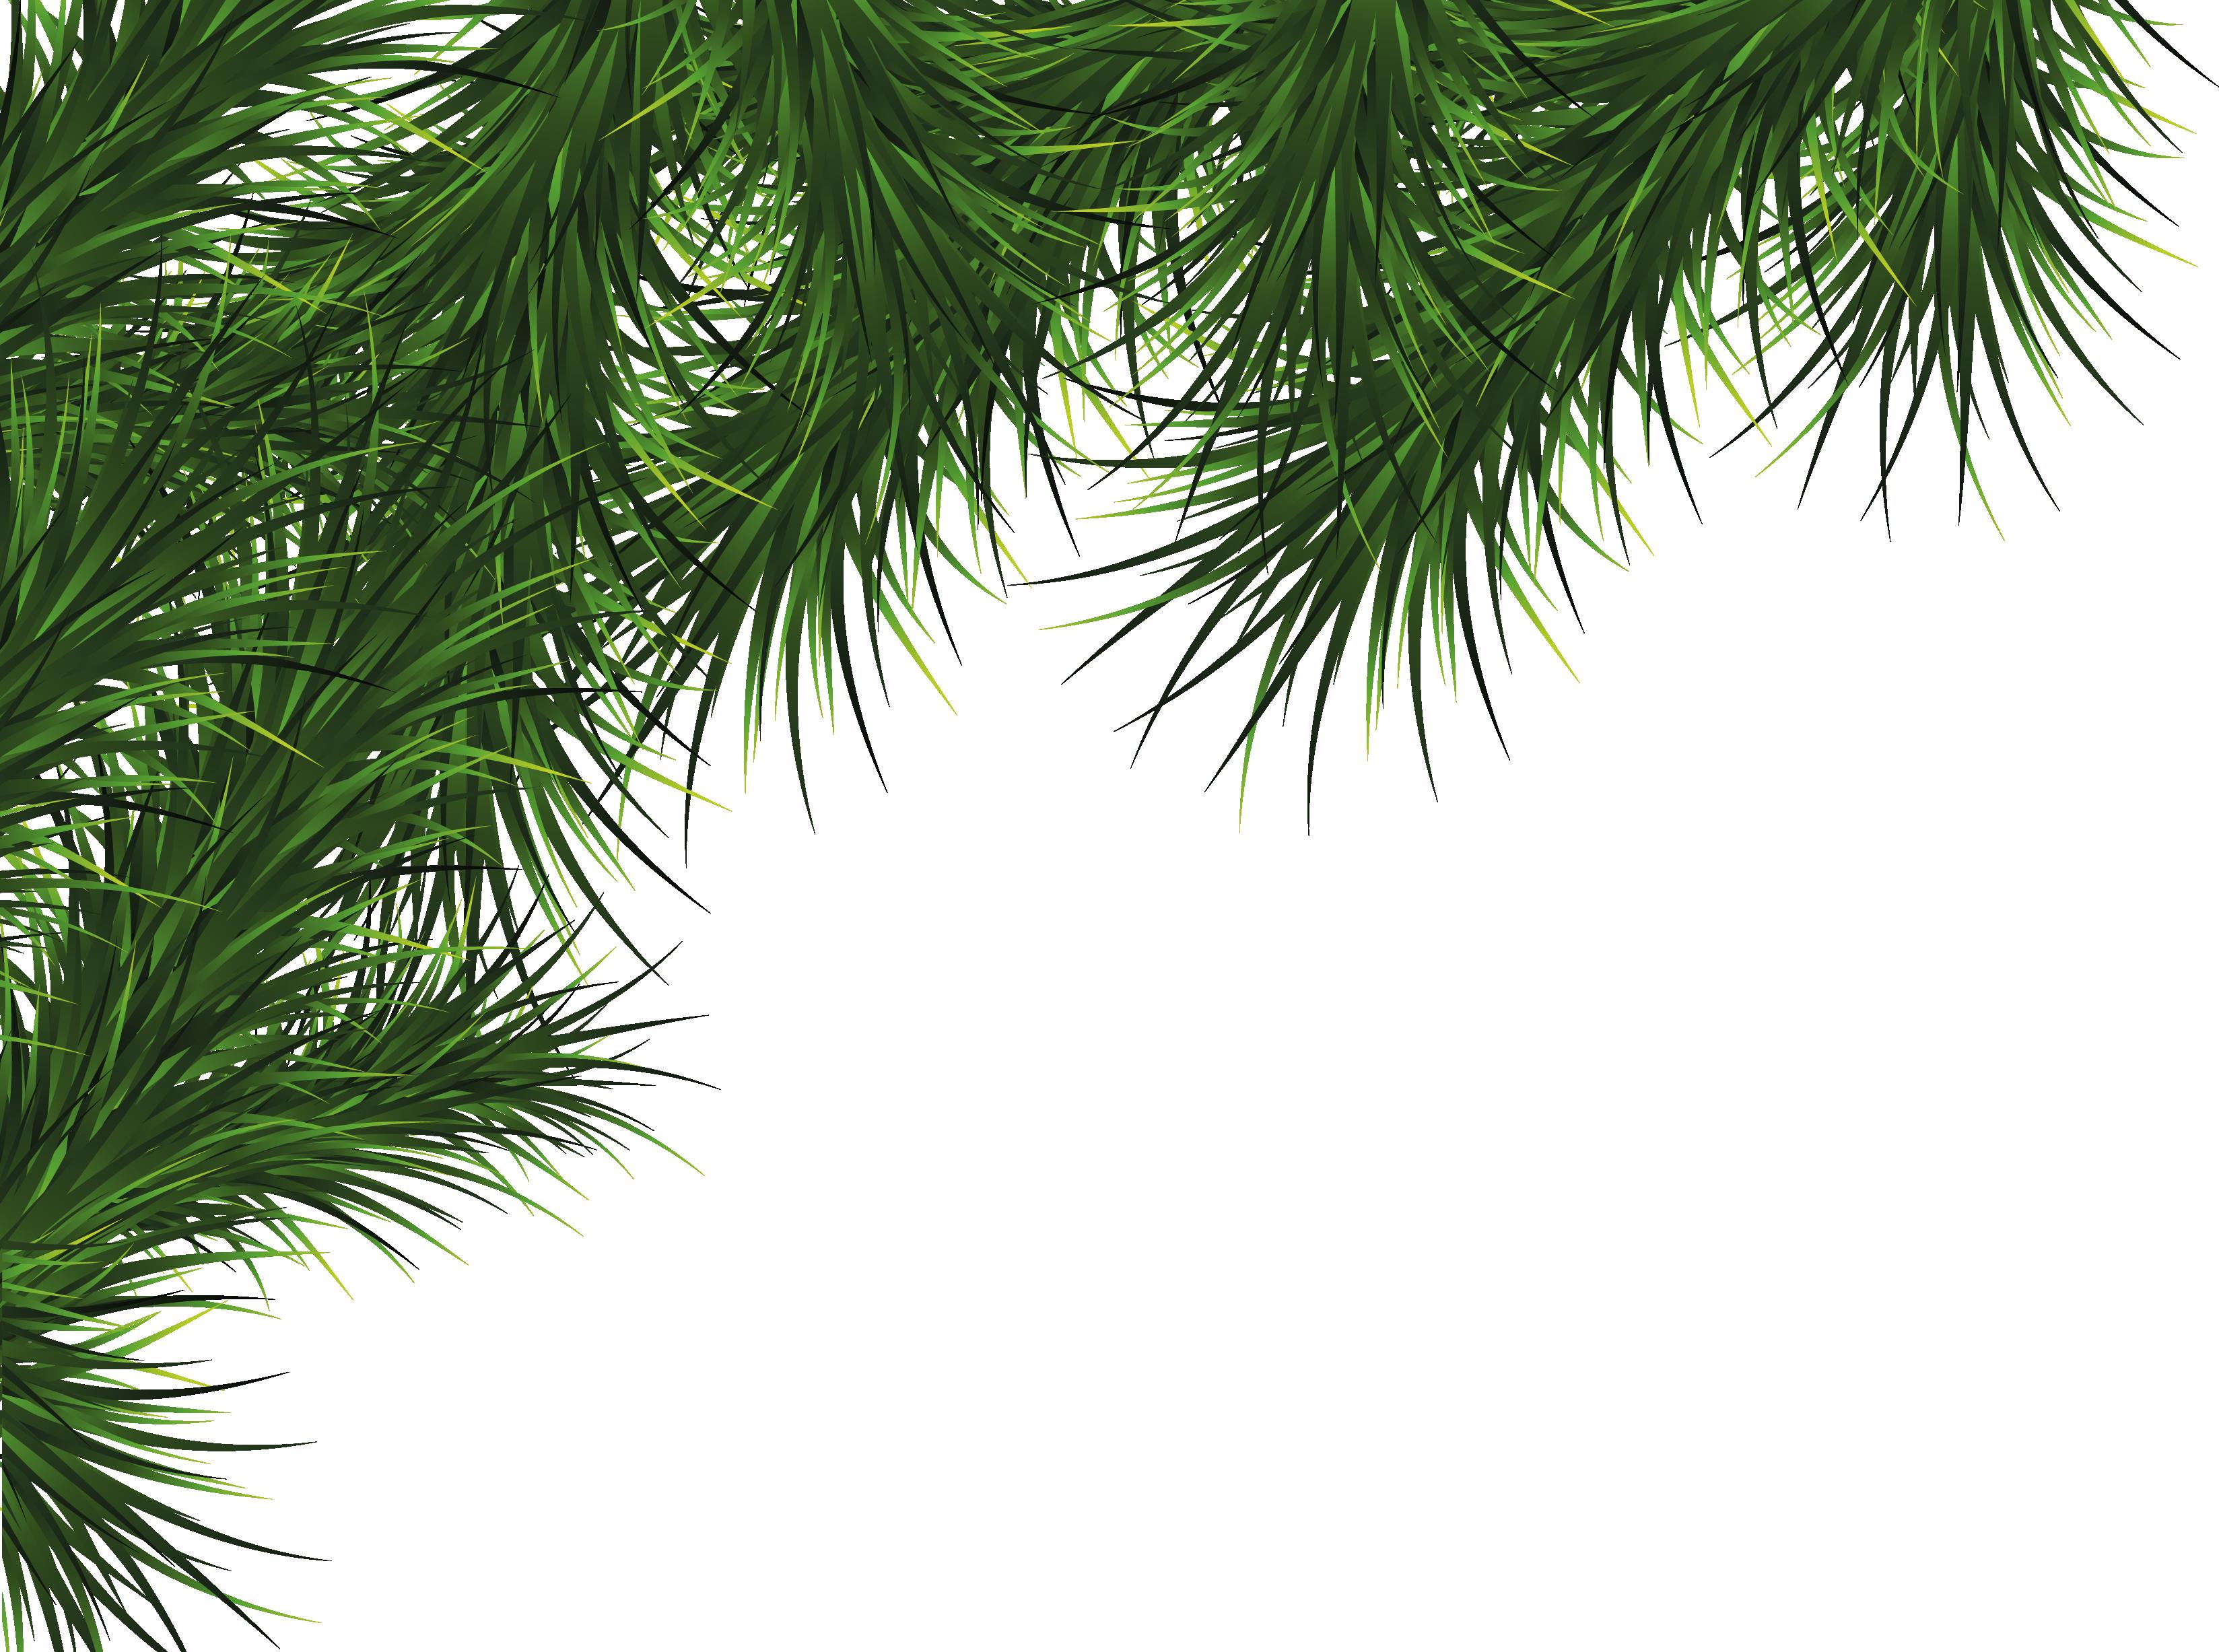 Fir Tree Png Image Fir Tree Tree Plant Leaves